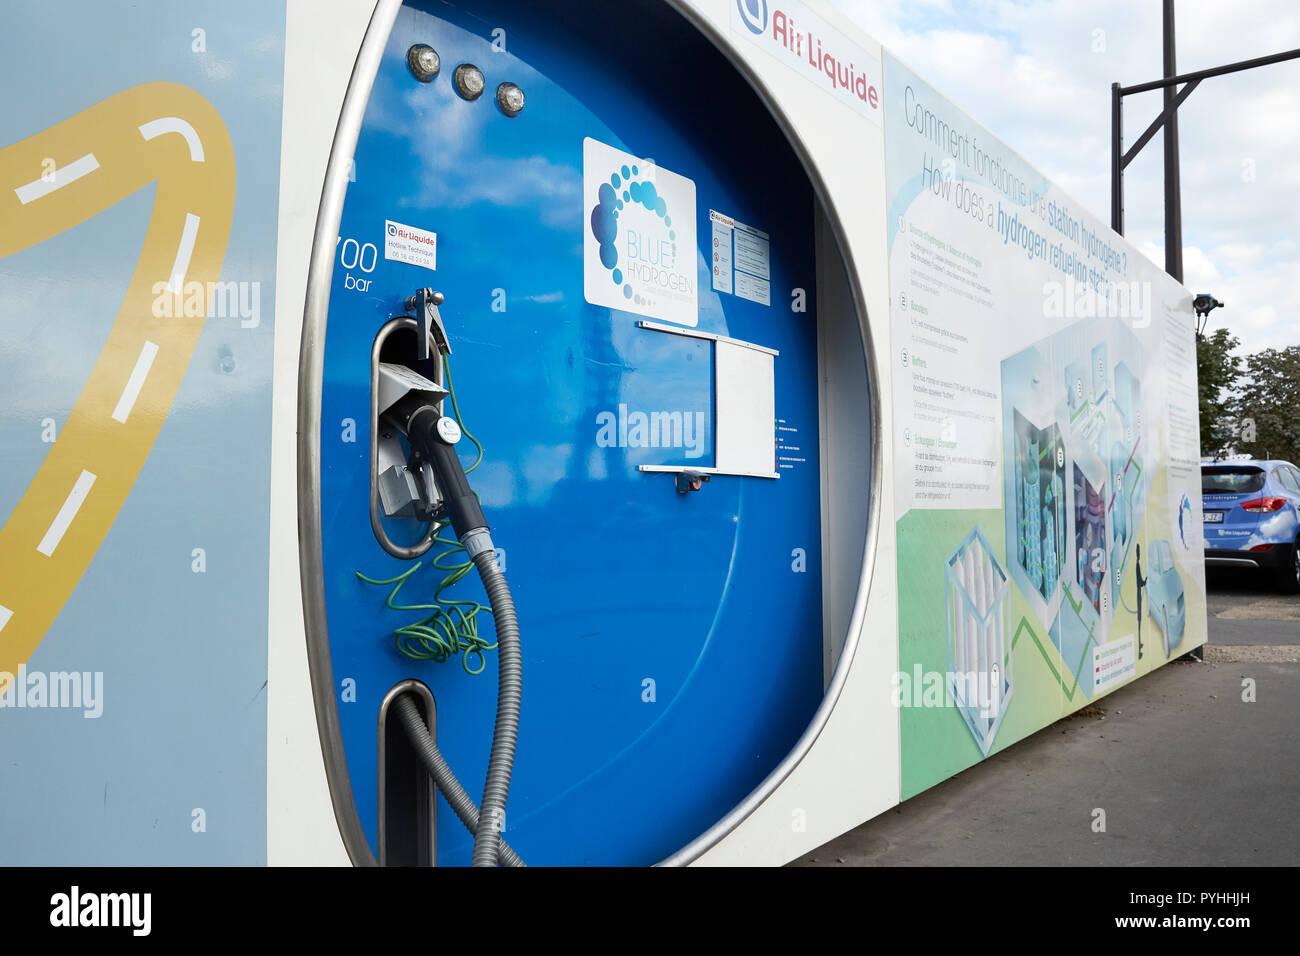 Paris, Ile-de-France, France - A hydrogen filling station in